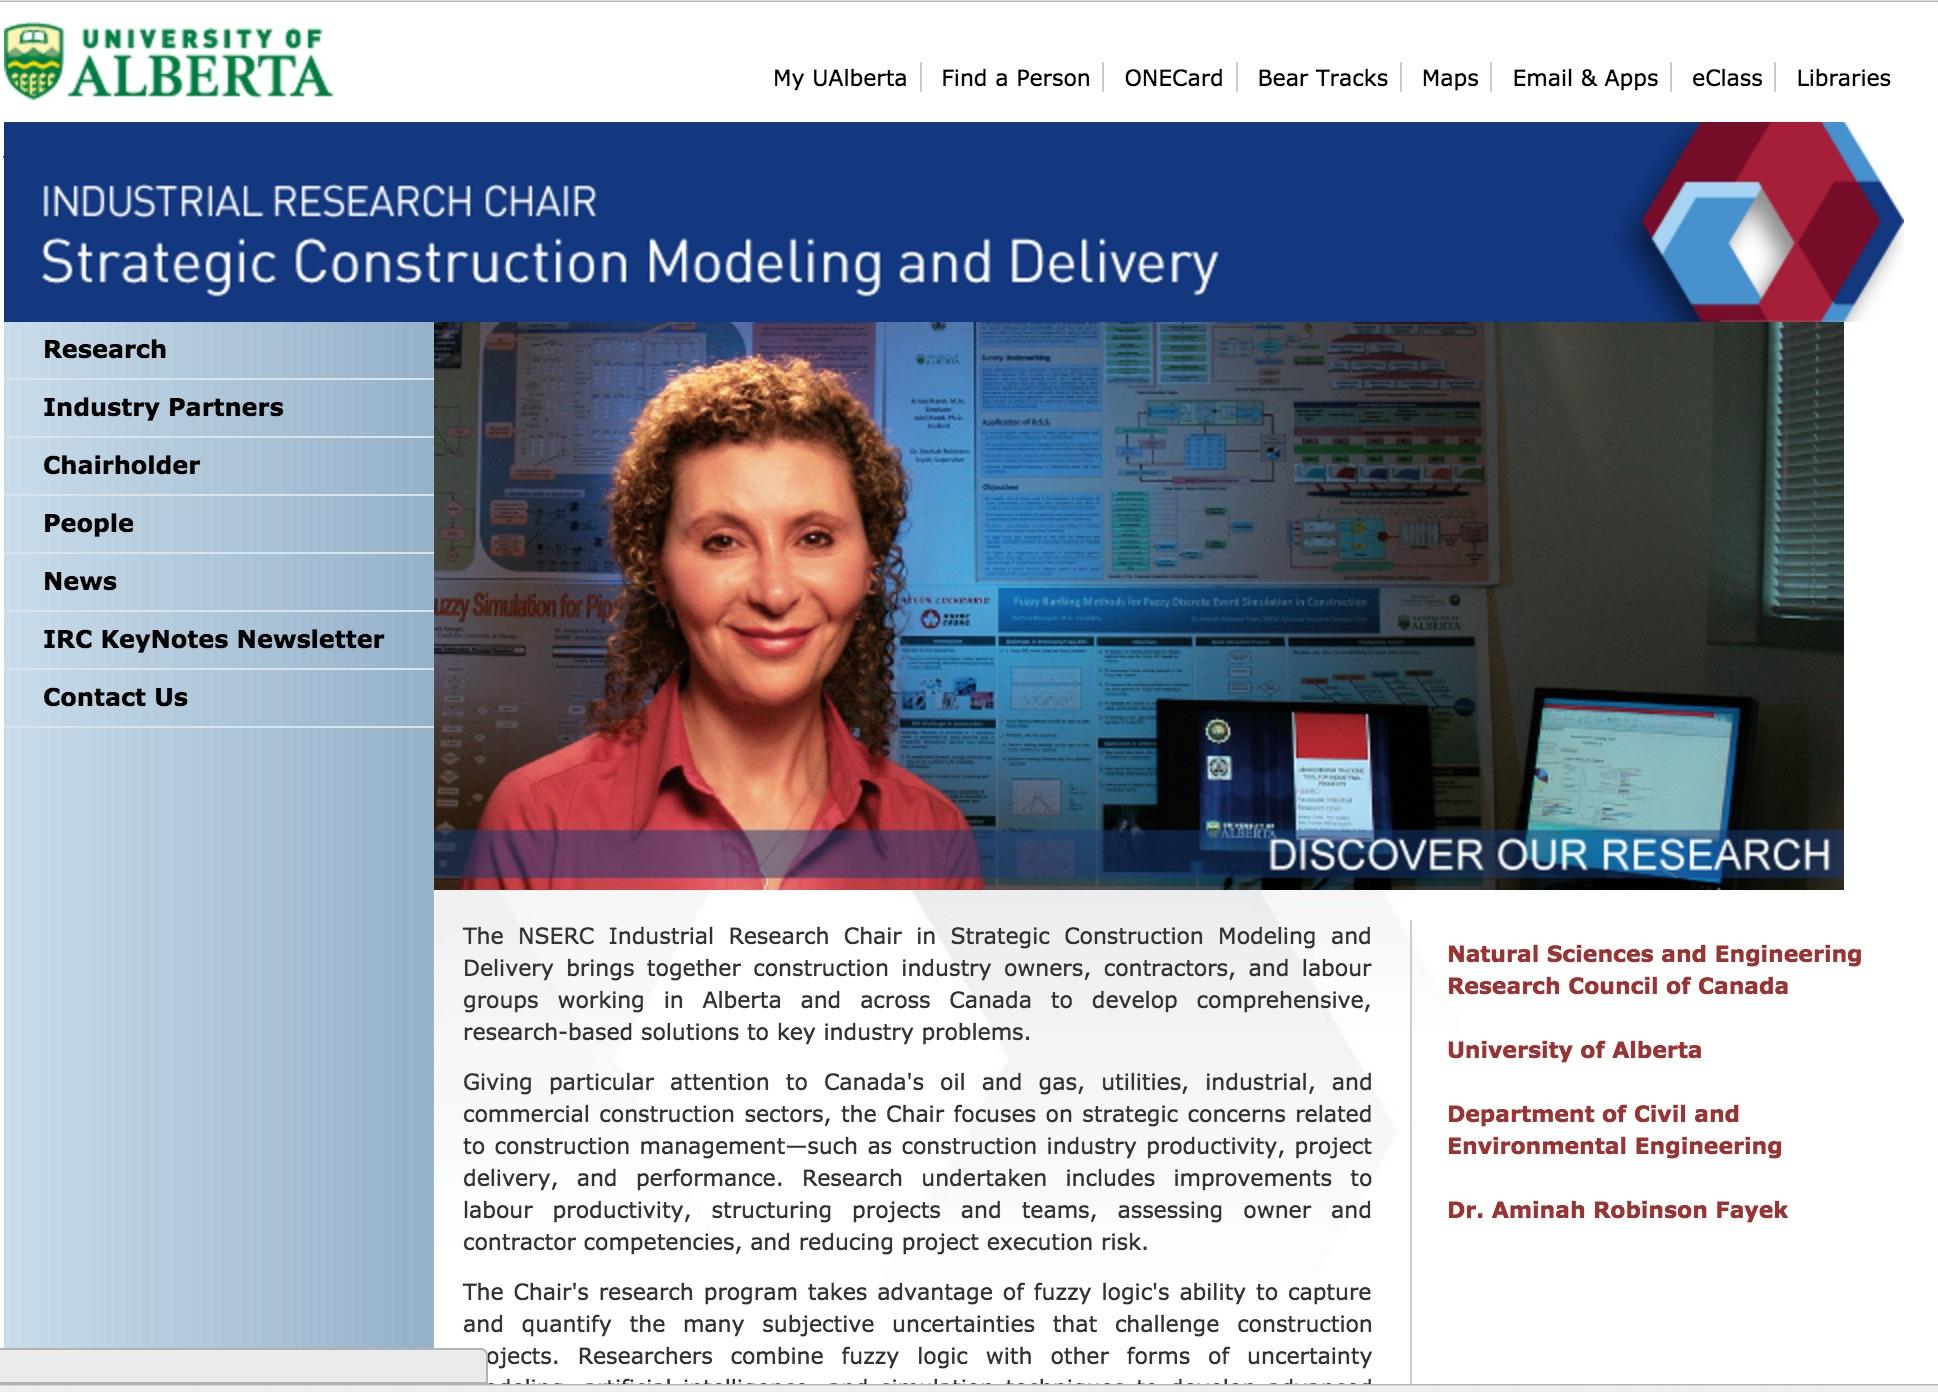 u of alberta construction research